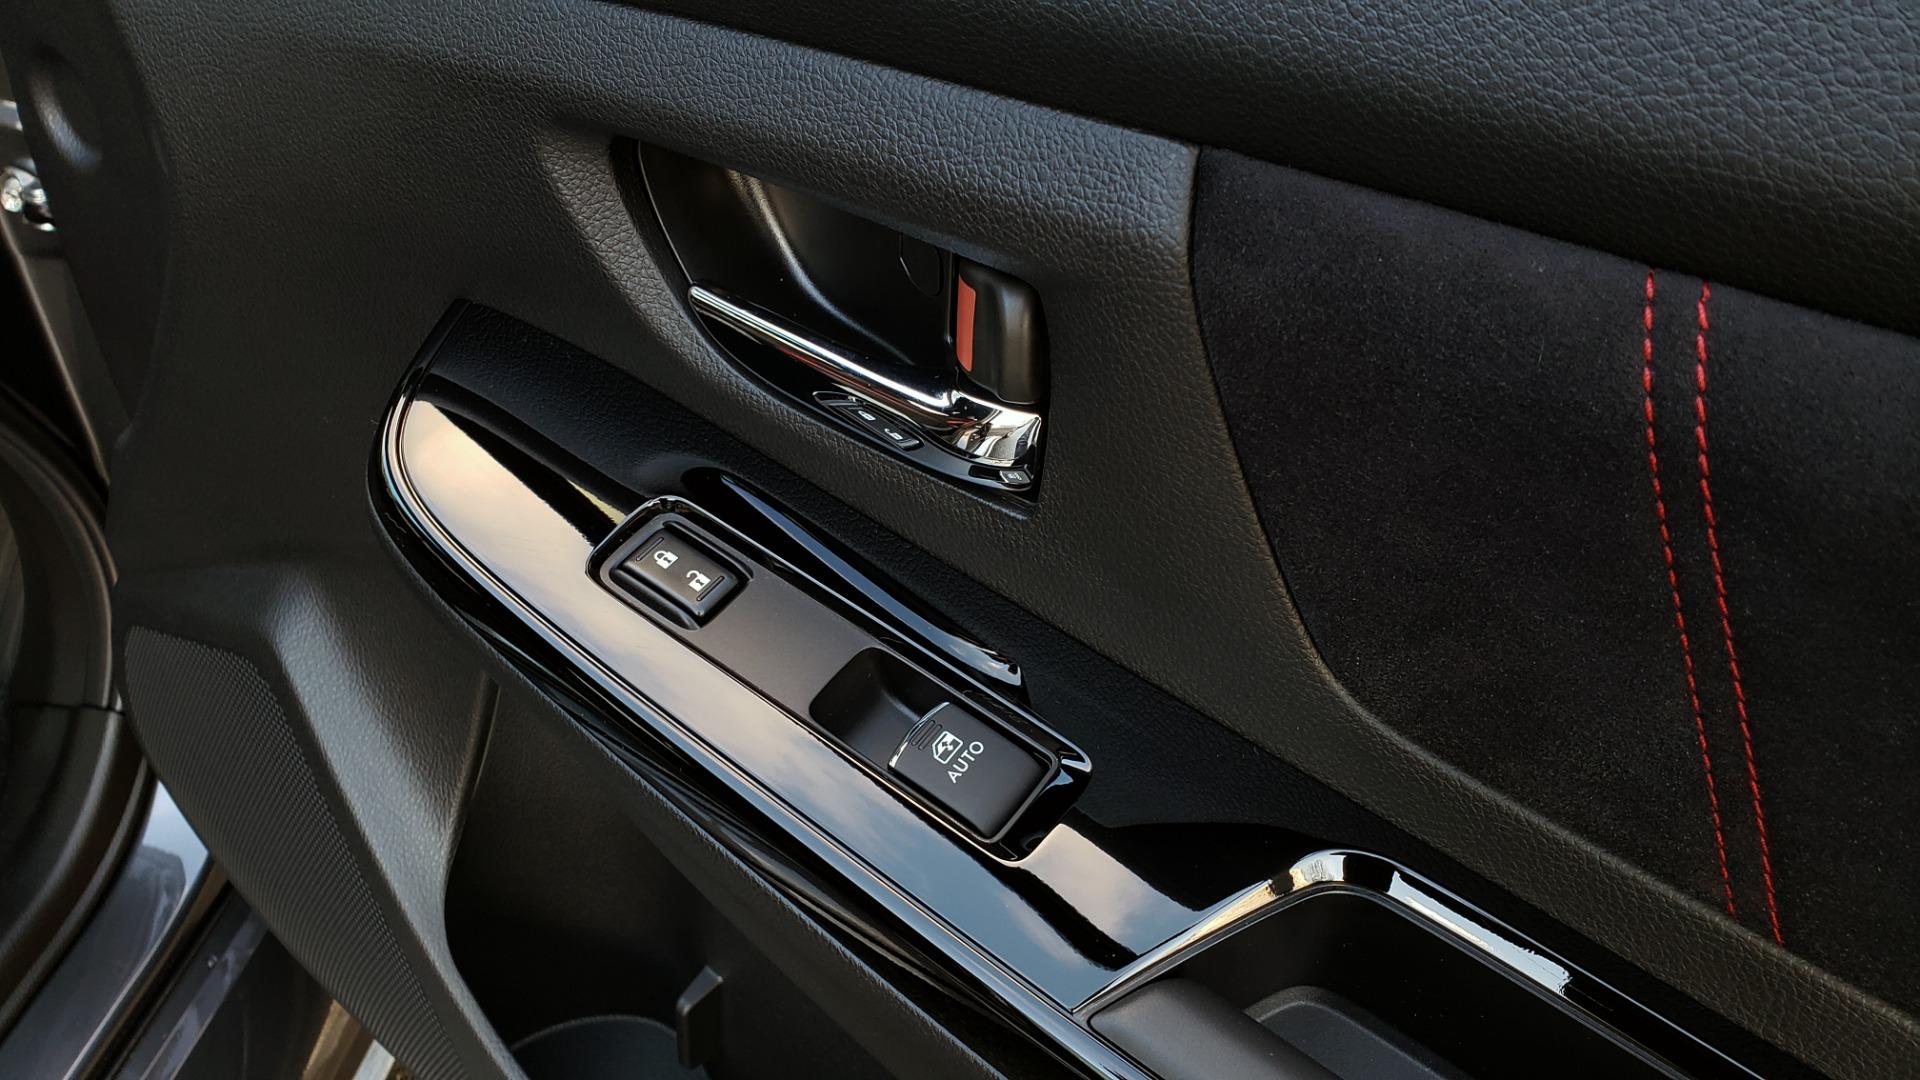 Used 2020 Subaru WRX STI 2.5L TURBO / 6-SPEED MANUAL / RECARO SEATS / REARVIEW for sale Sold at Formula Imports in Charlotte NC 28227 75